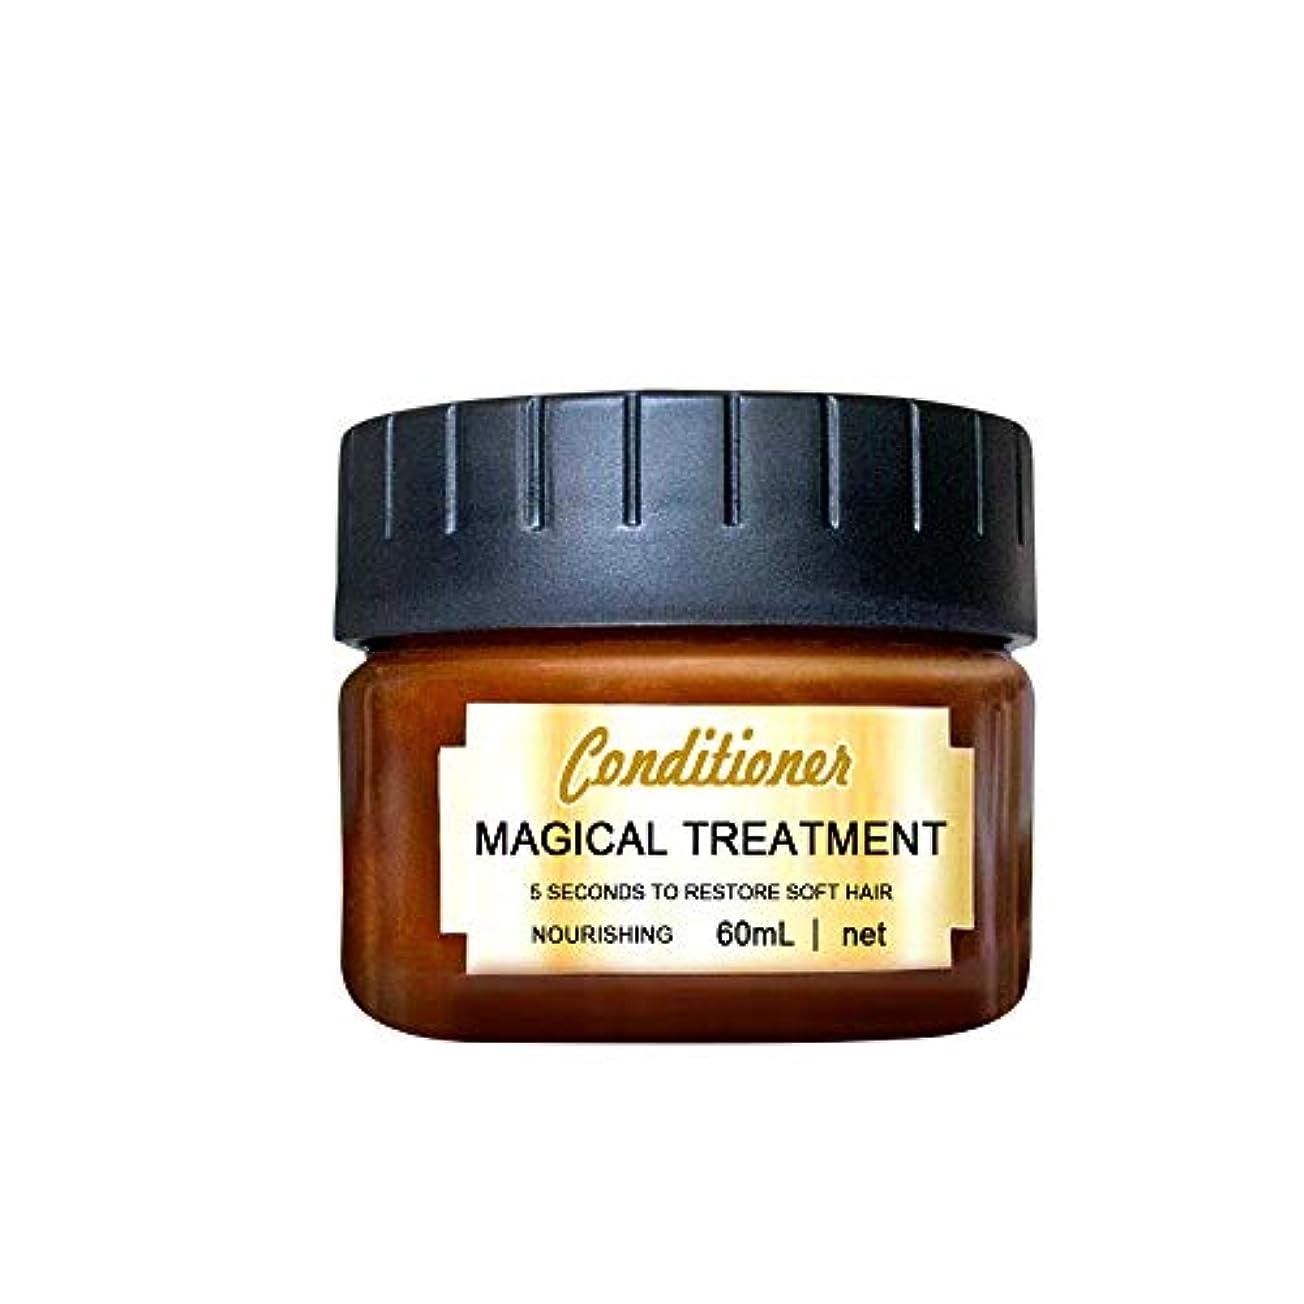 DOUJI植物成分 ヘアケア リッチリペア コンディショナー60mlダメージのある髪へ 弾力性回復 高度な分子毛根治療回復 髪の栄養素を補給トリートメント